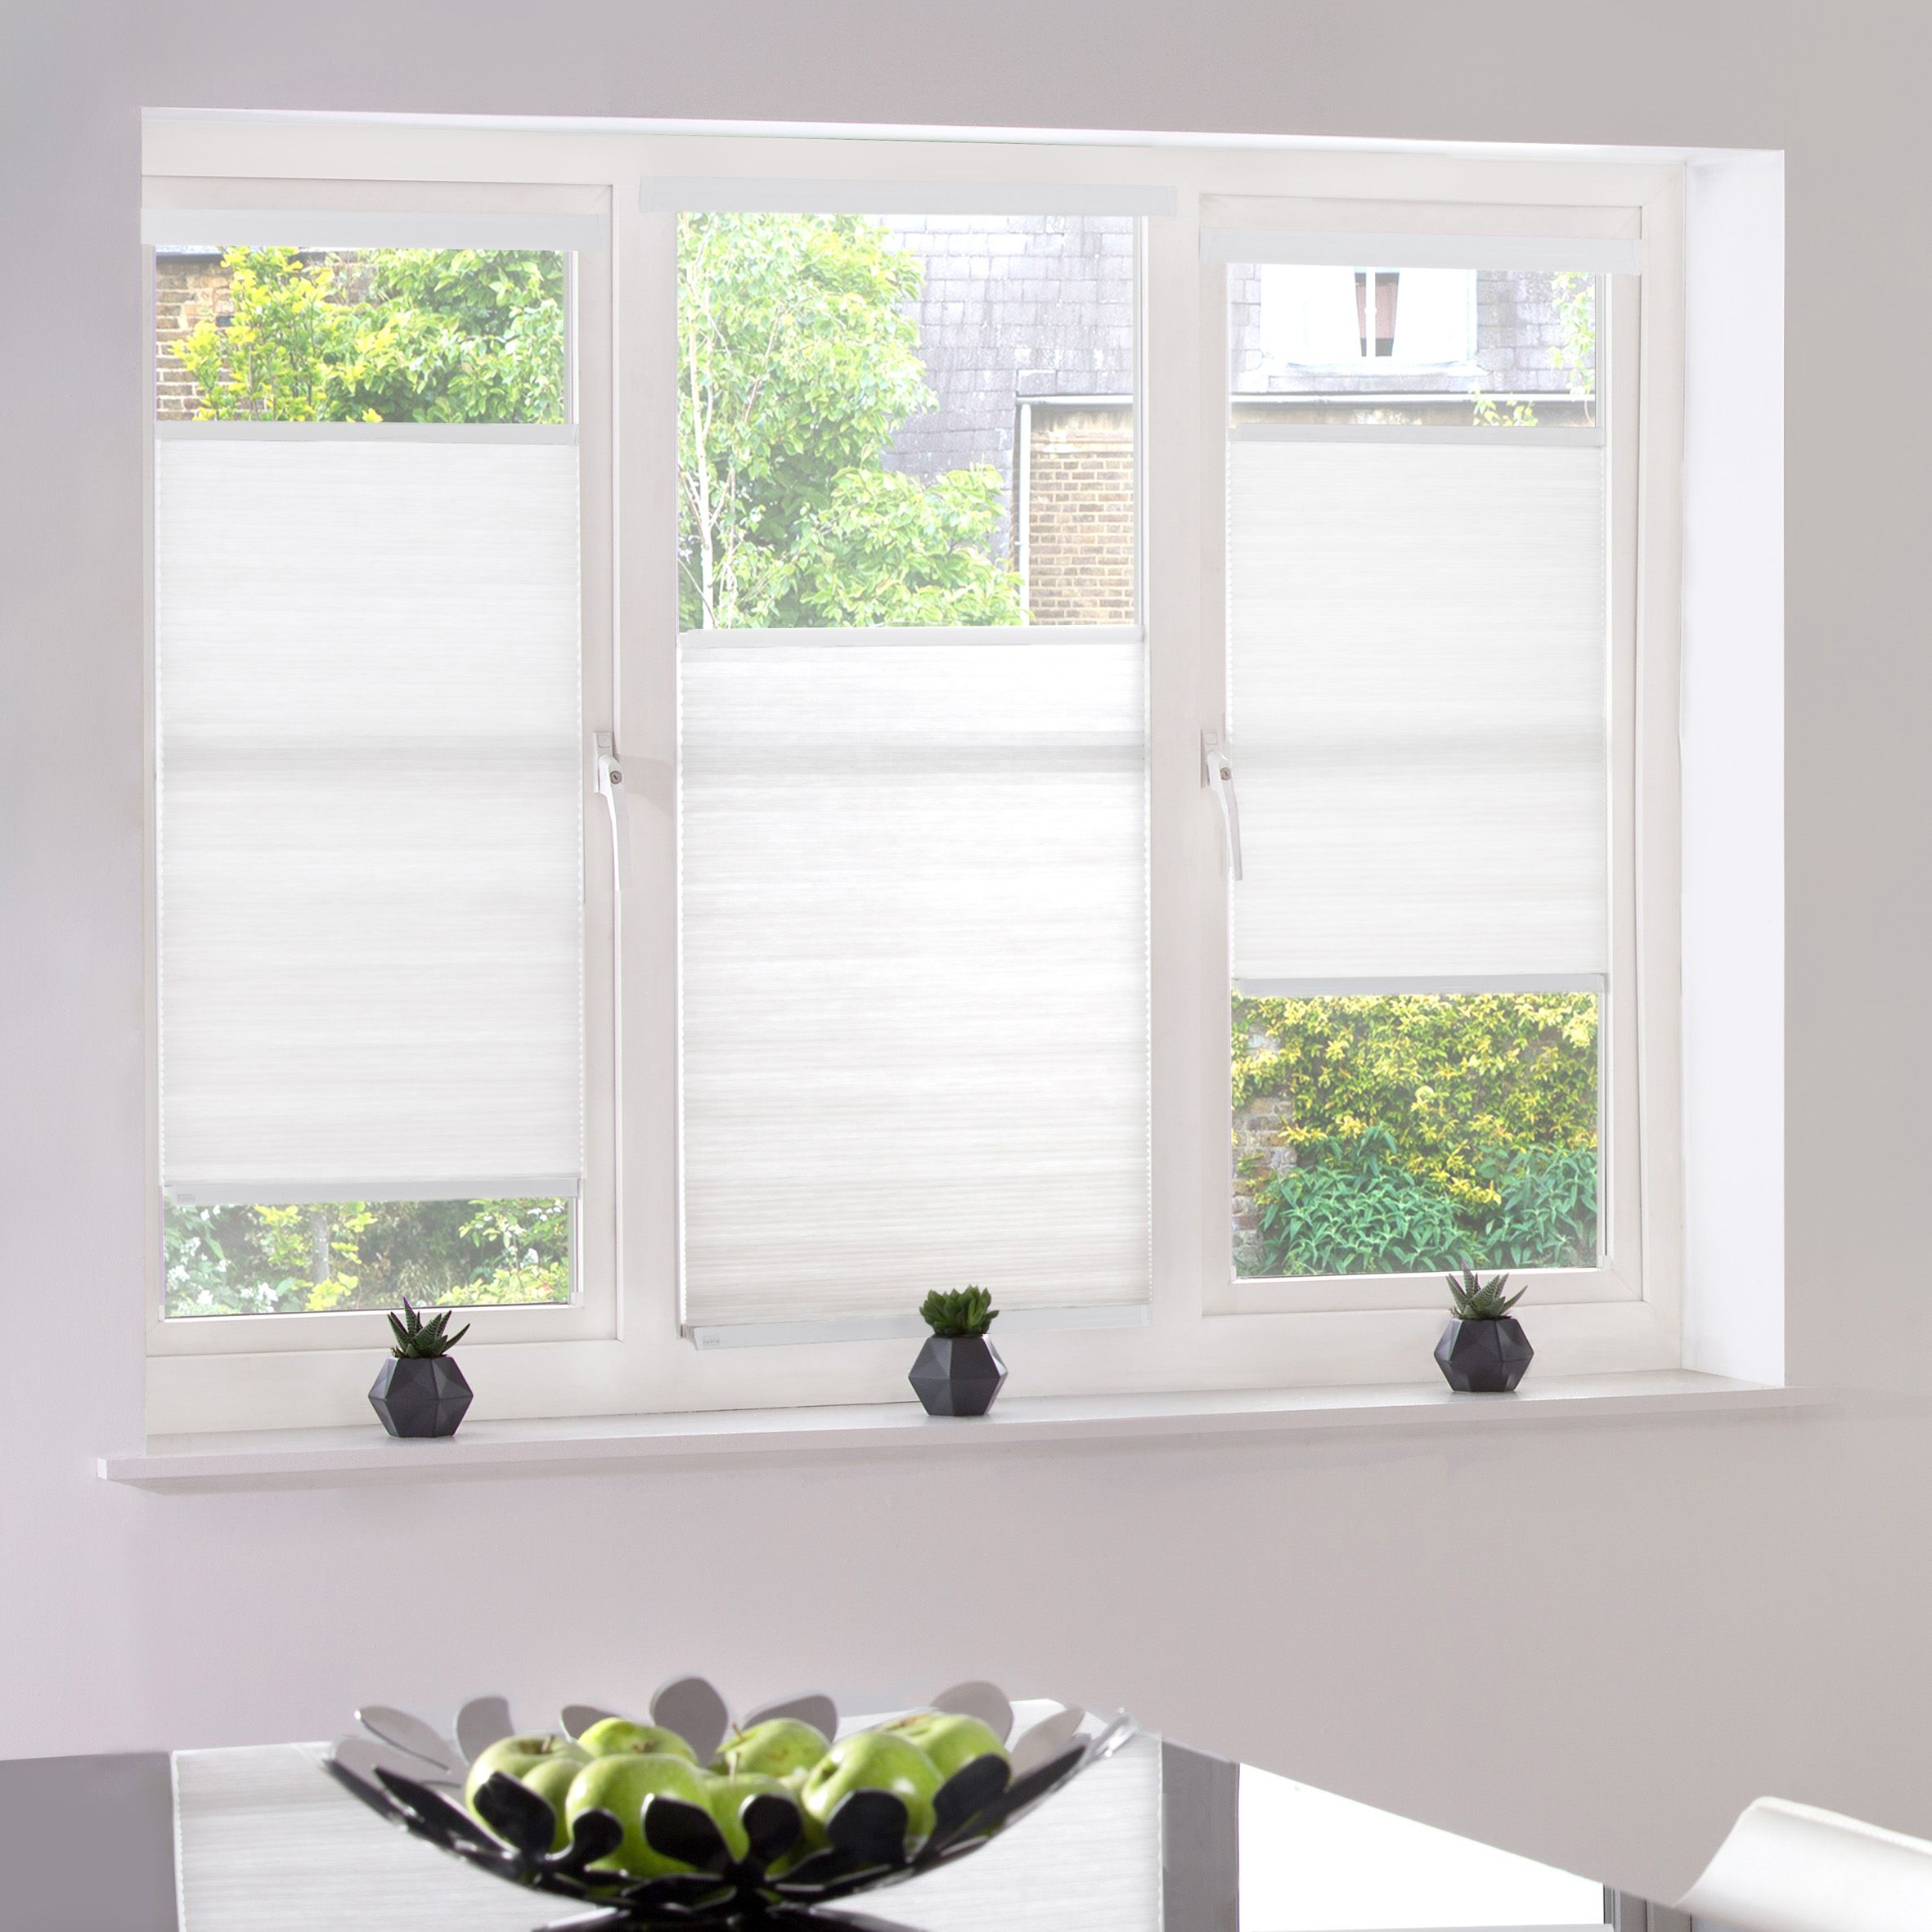 Kitchen window kitchen blinds  style studio hive deluxe blinds in dove kitchen blinds hive blinds